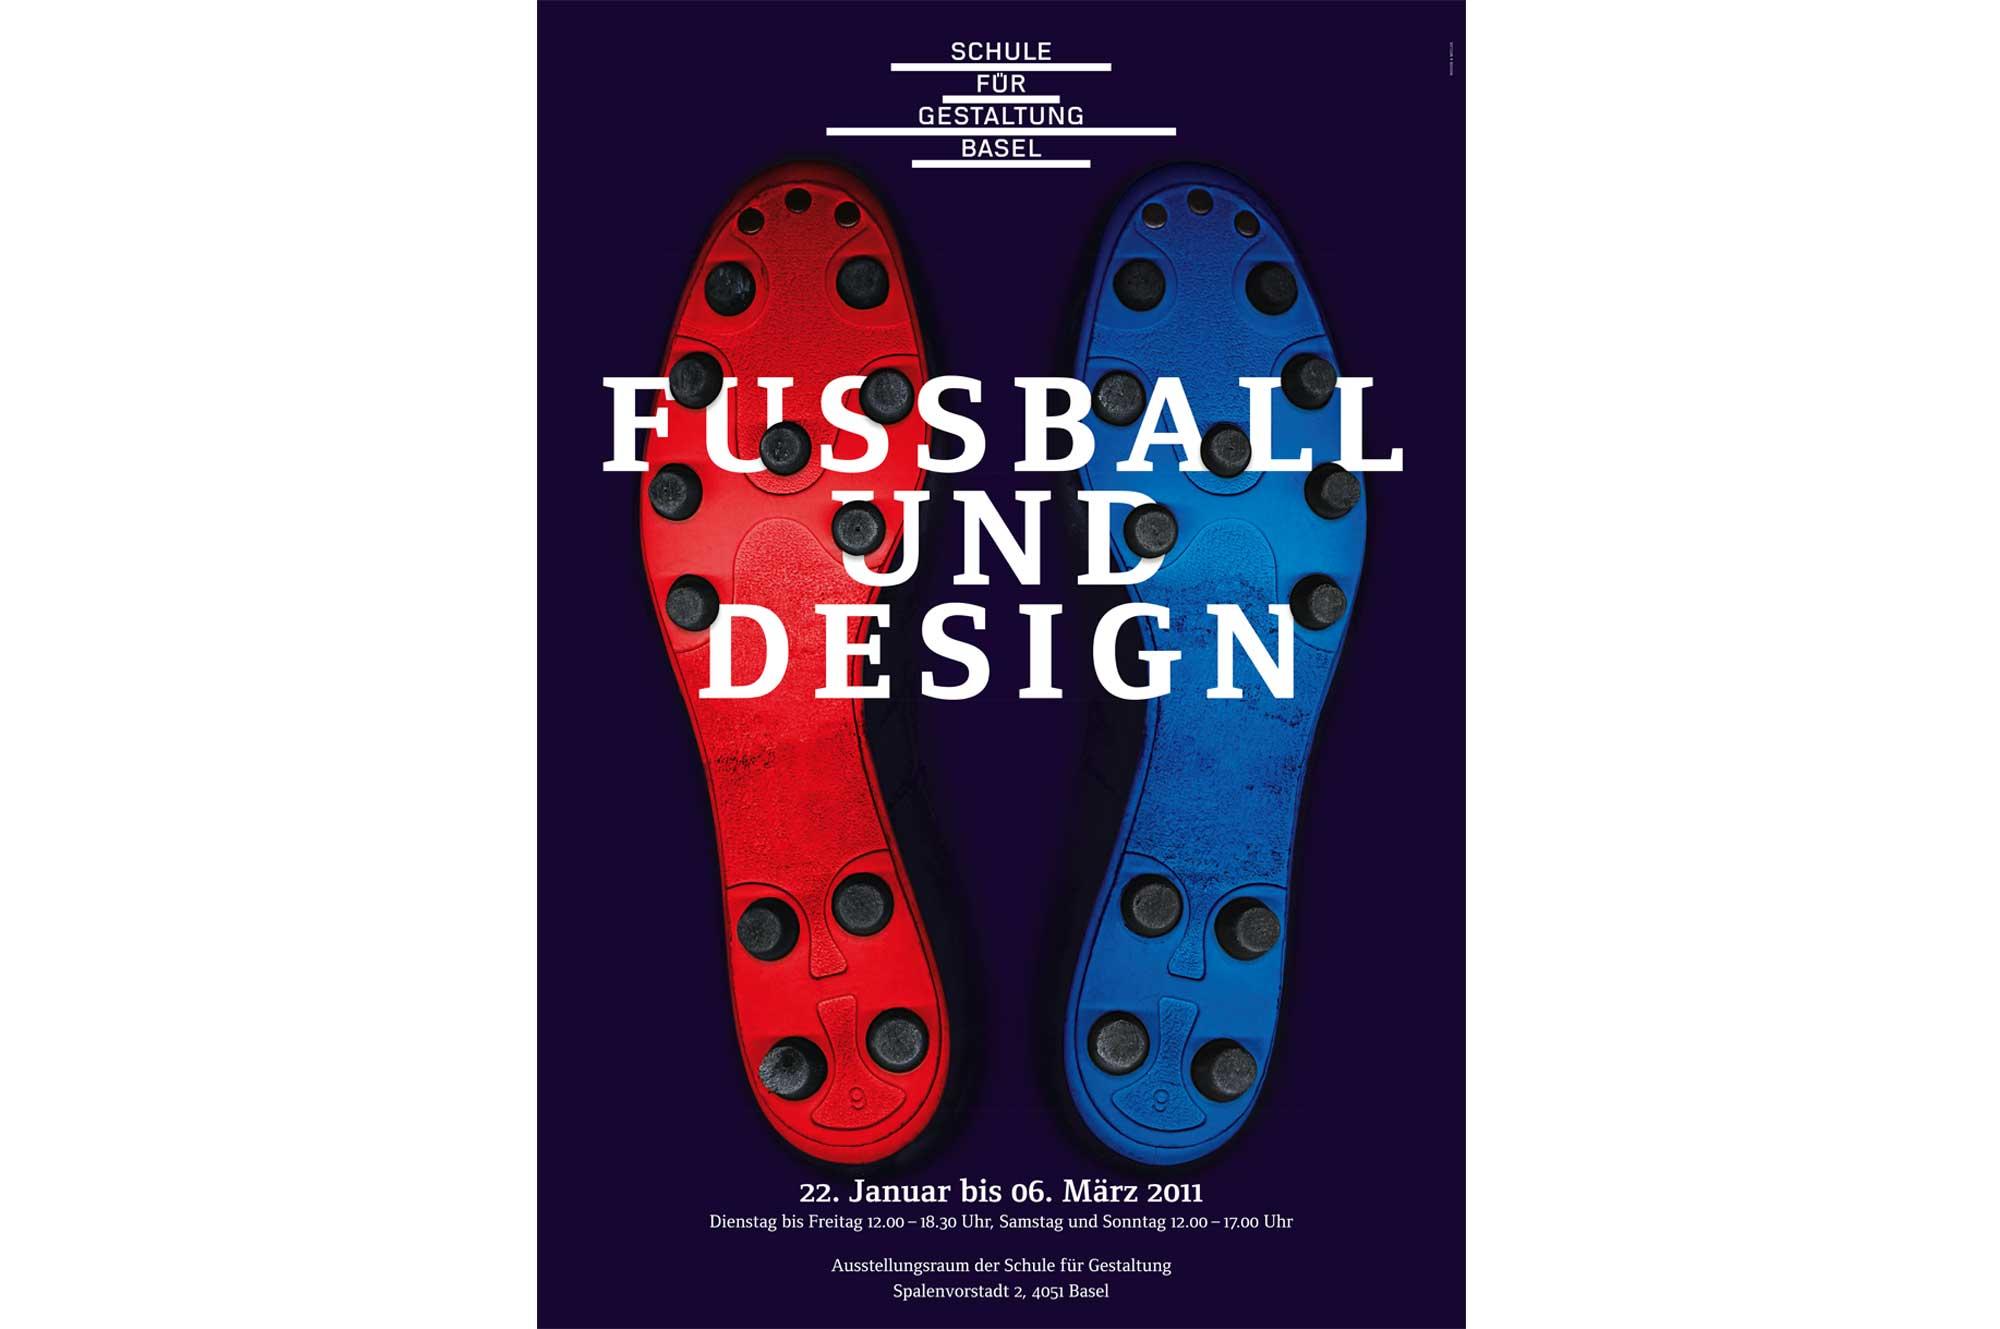 2011 fusball design web 13